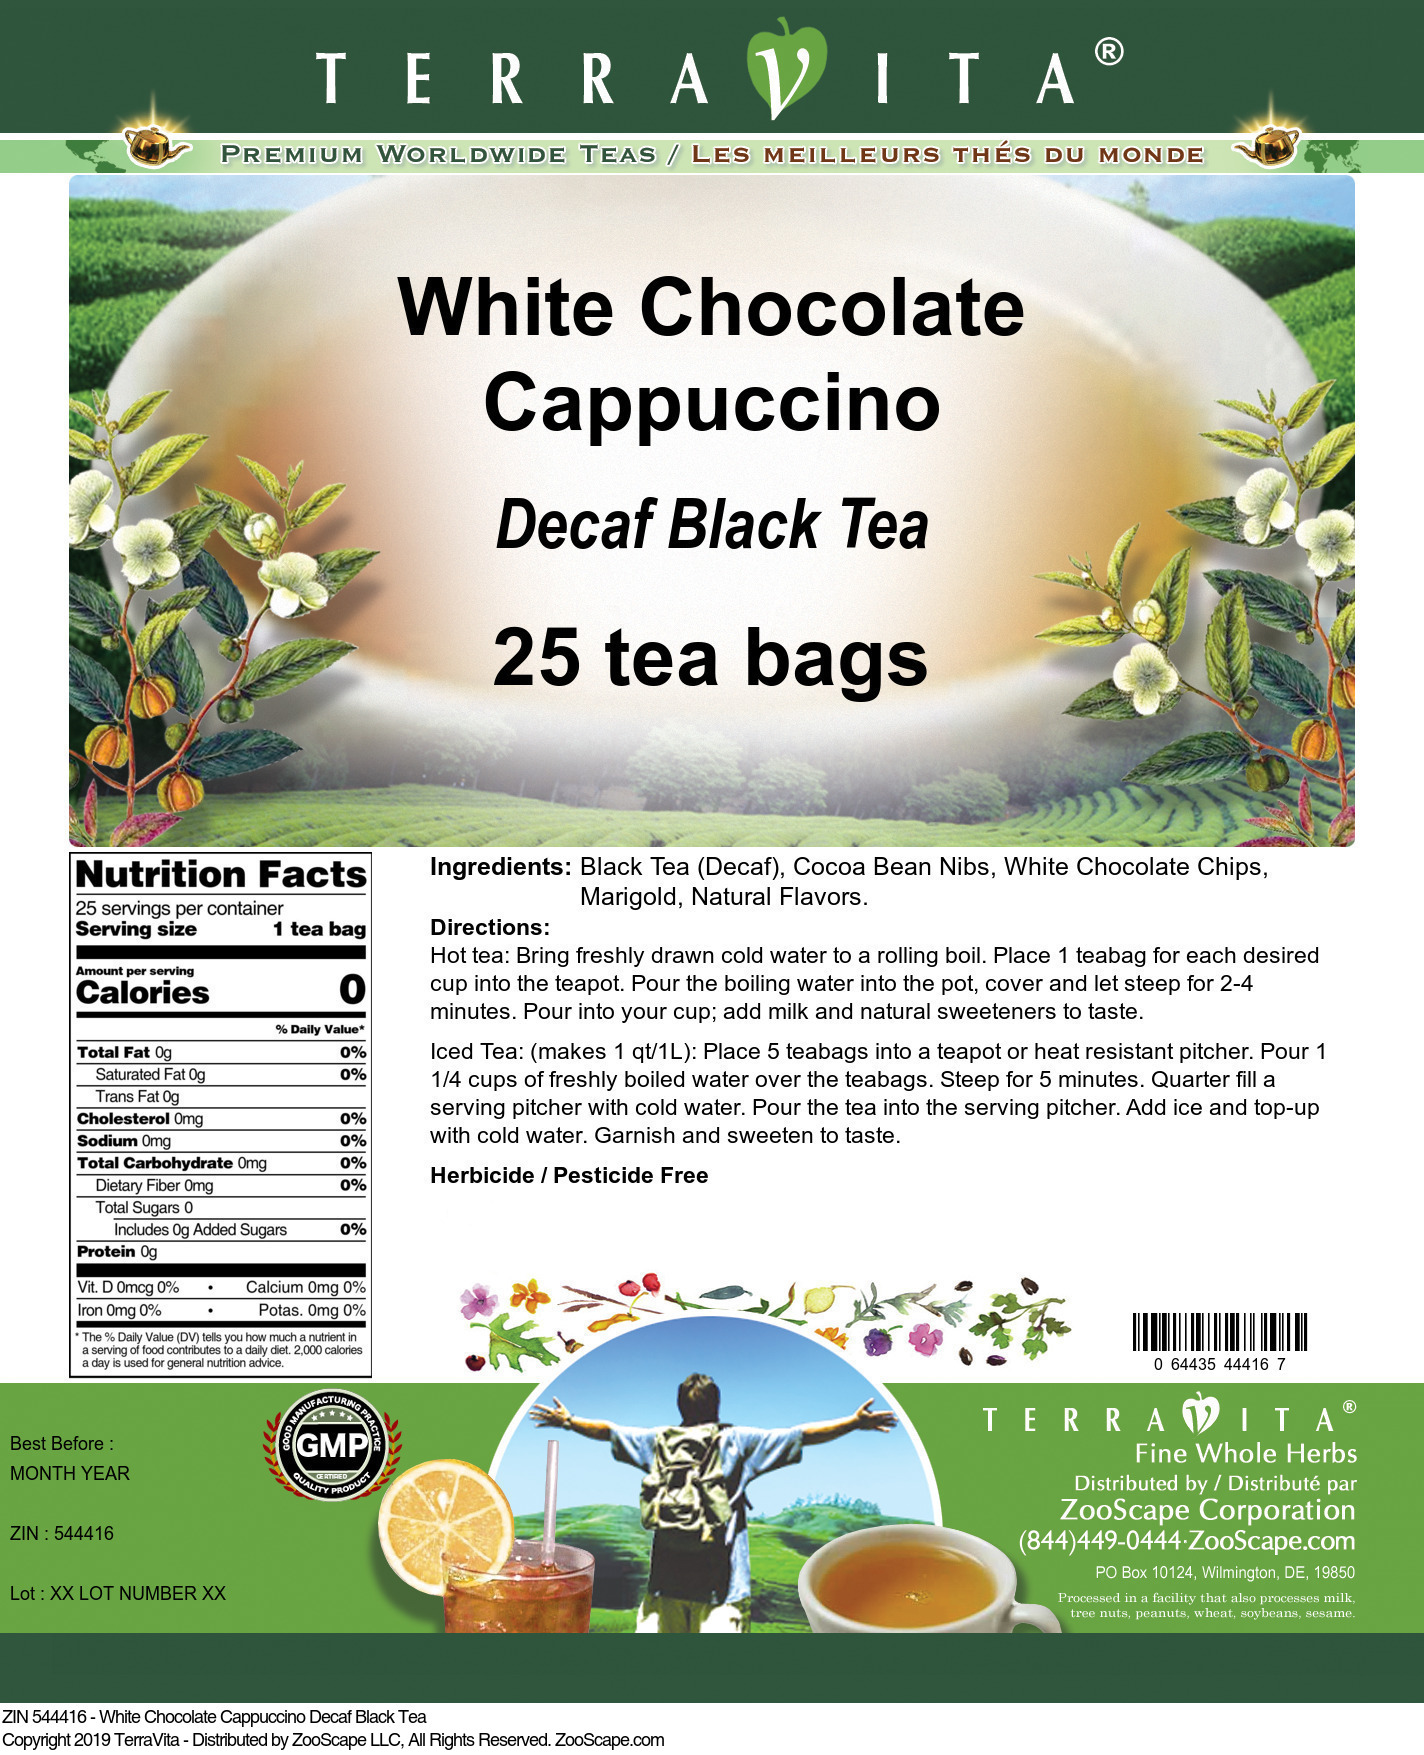 White Chocolate Cappuccino Decaf Black Tea